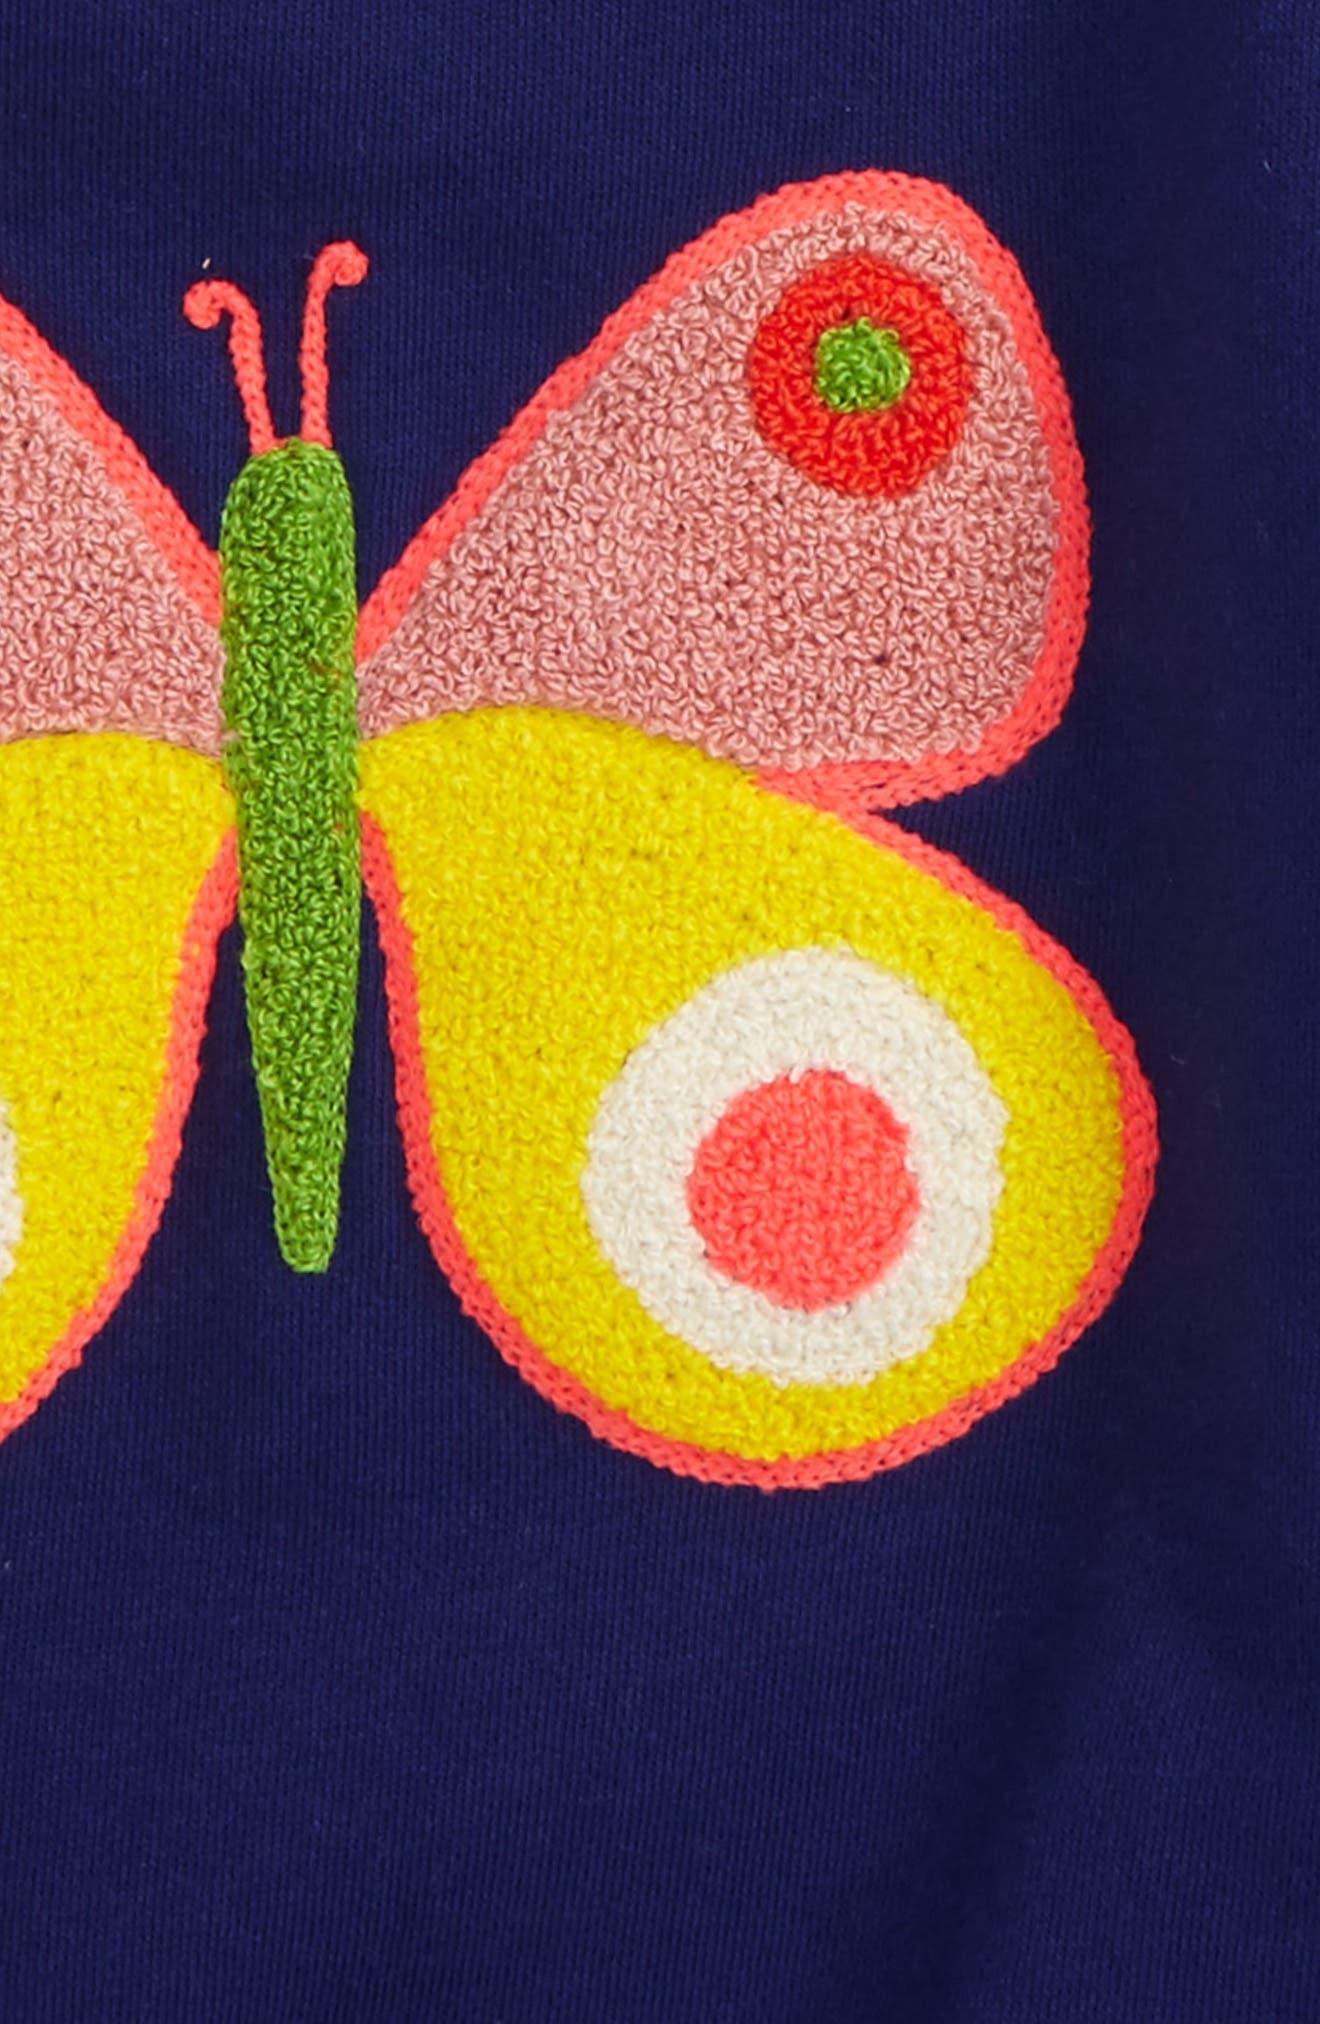 Alternate Image 2  - Mini Boden Bouclé Embroidered Sweatshirt (Toddler Girls, Little Girls & Big Girls)